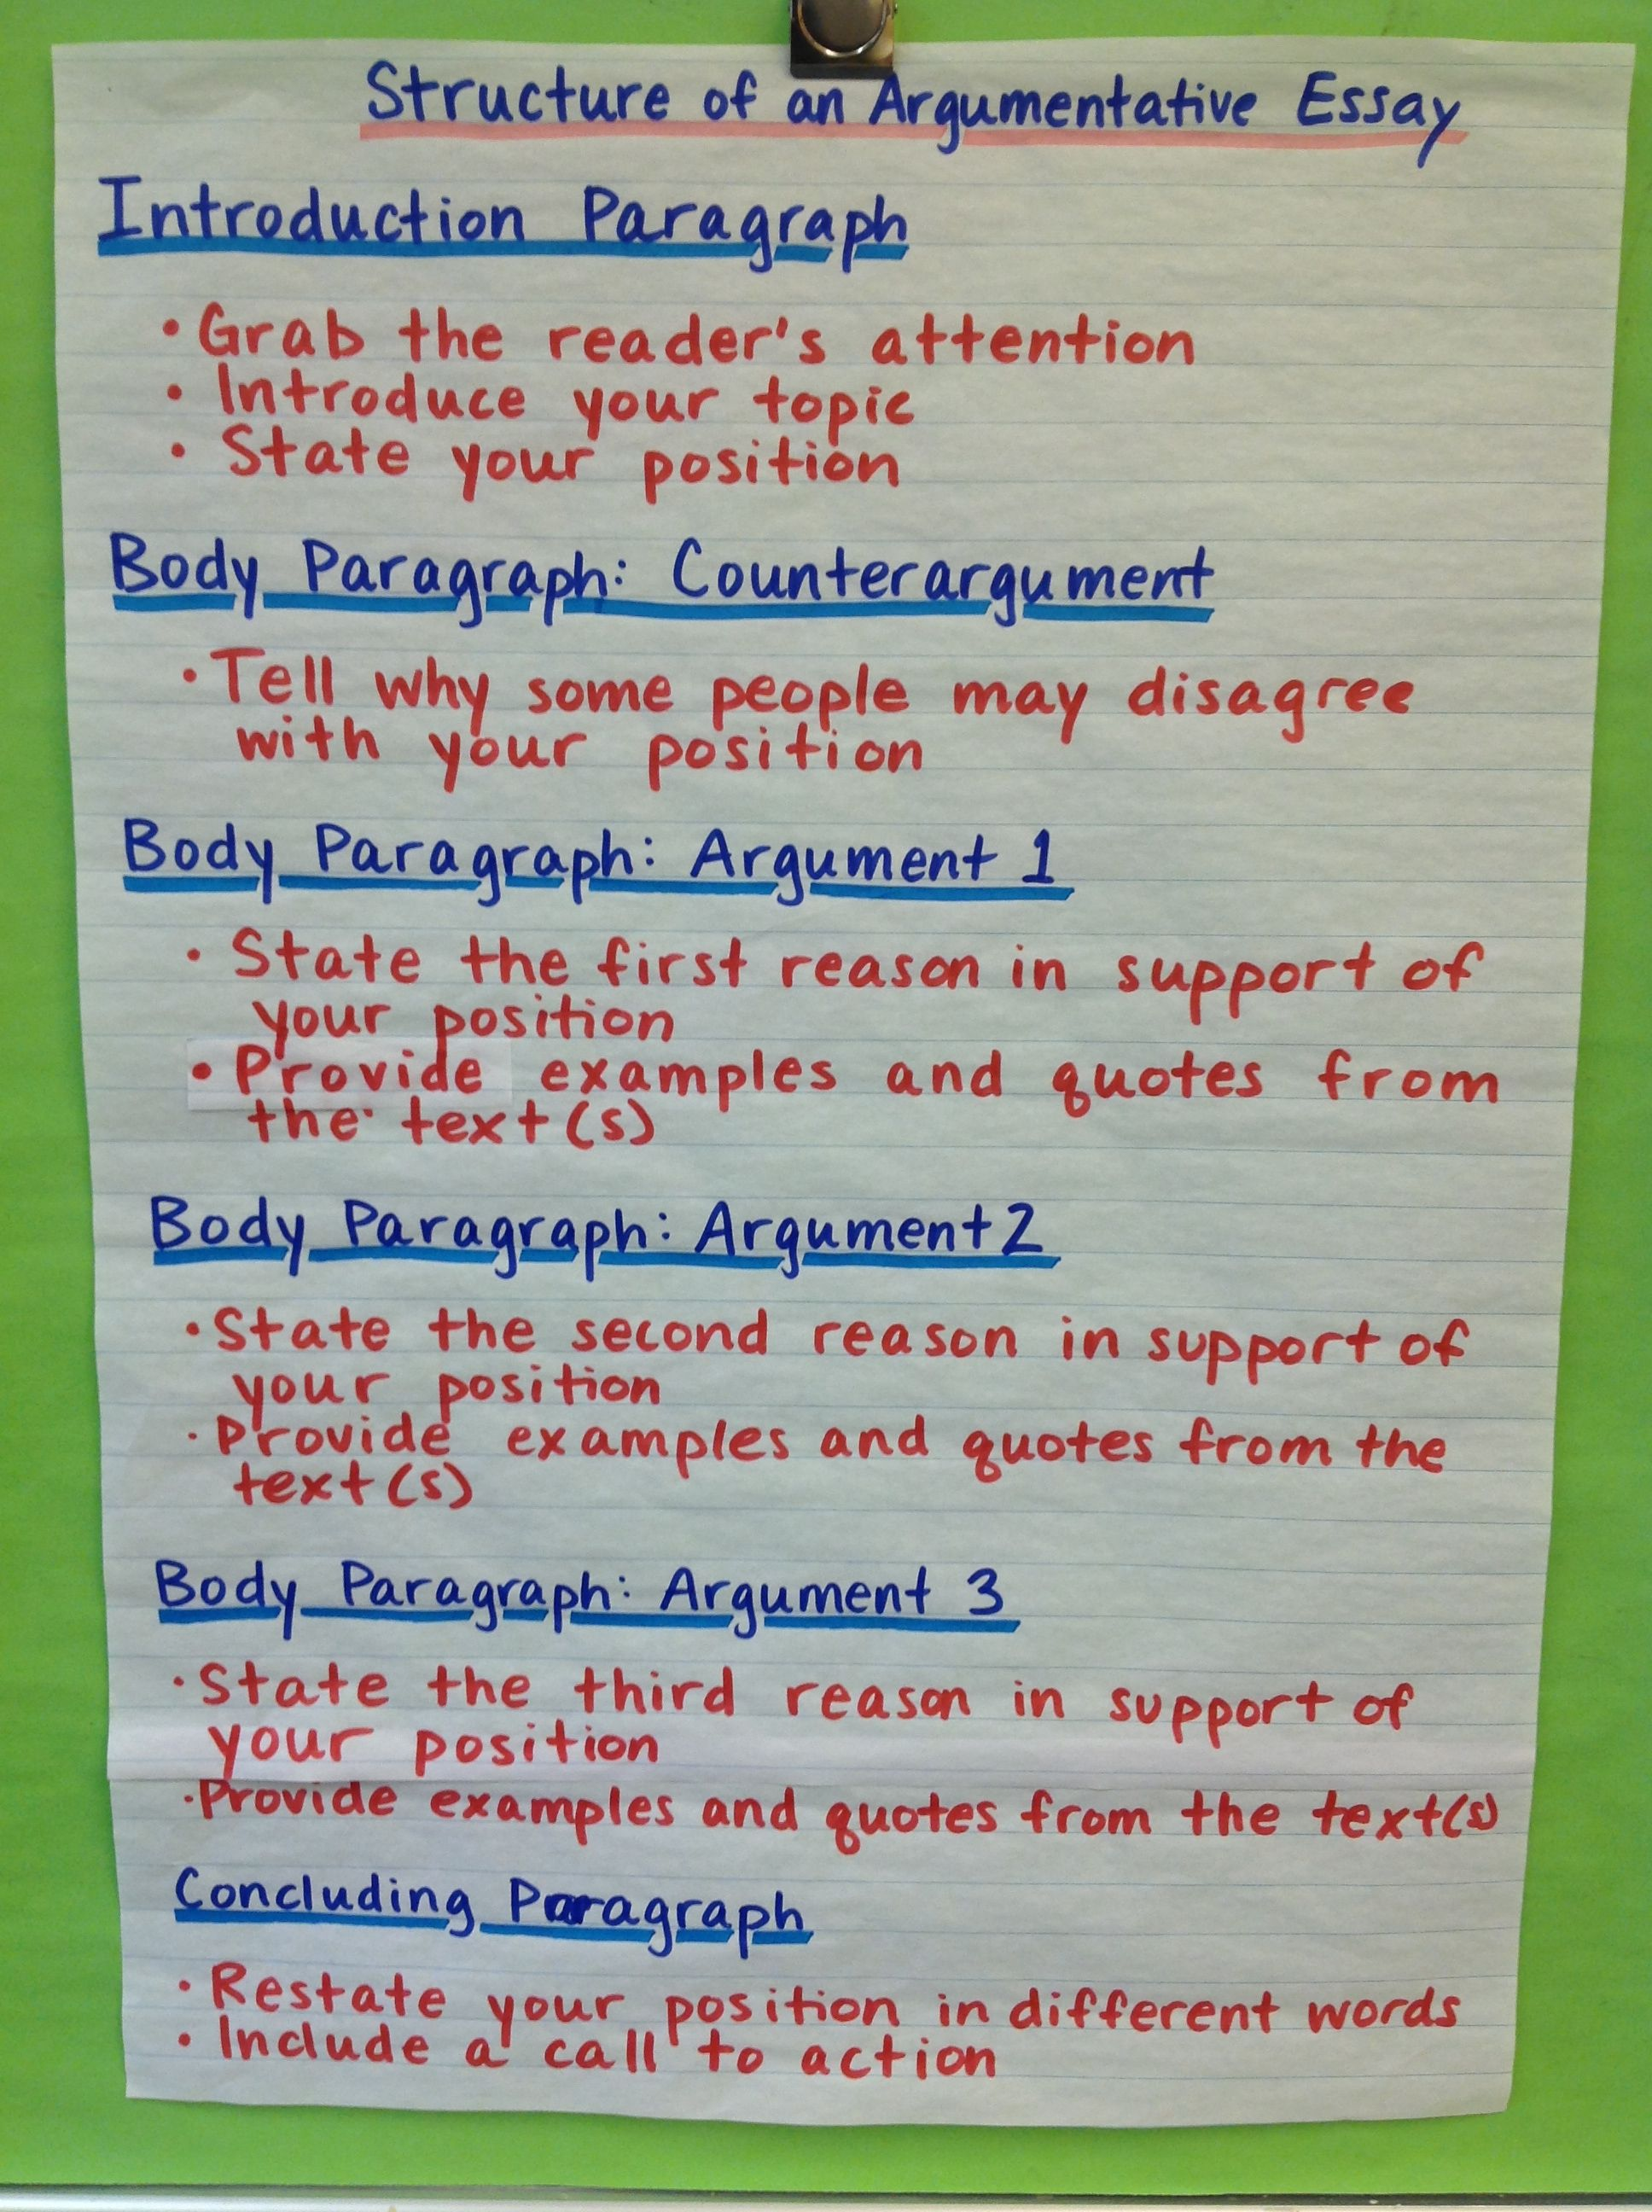 Argumentative essay structure chart also teaching stuff rh pinterest